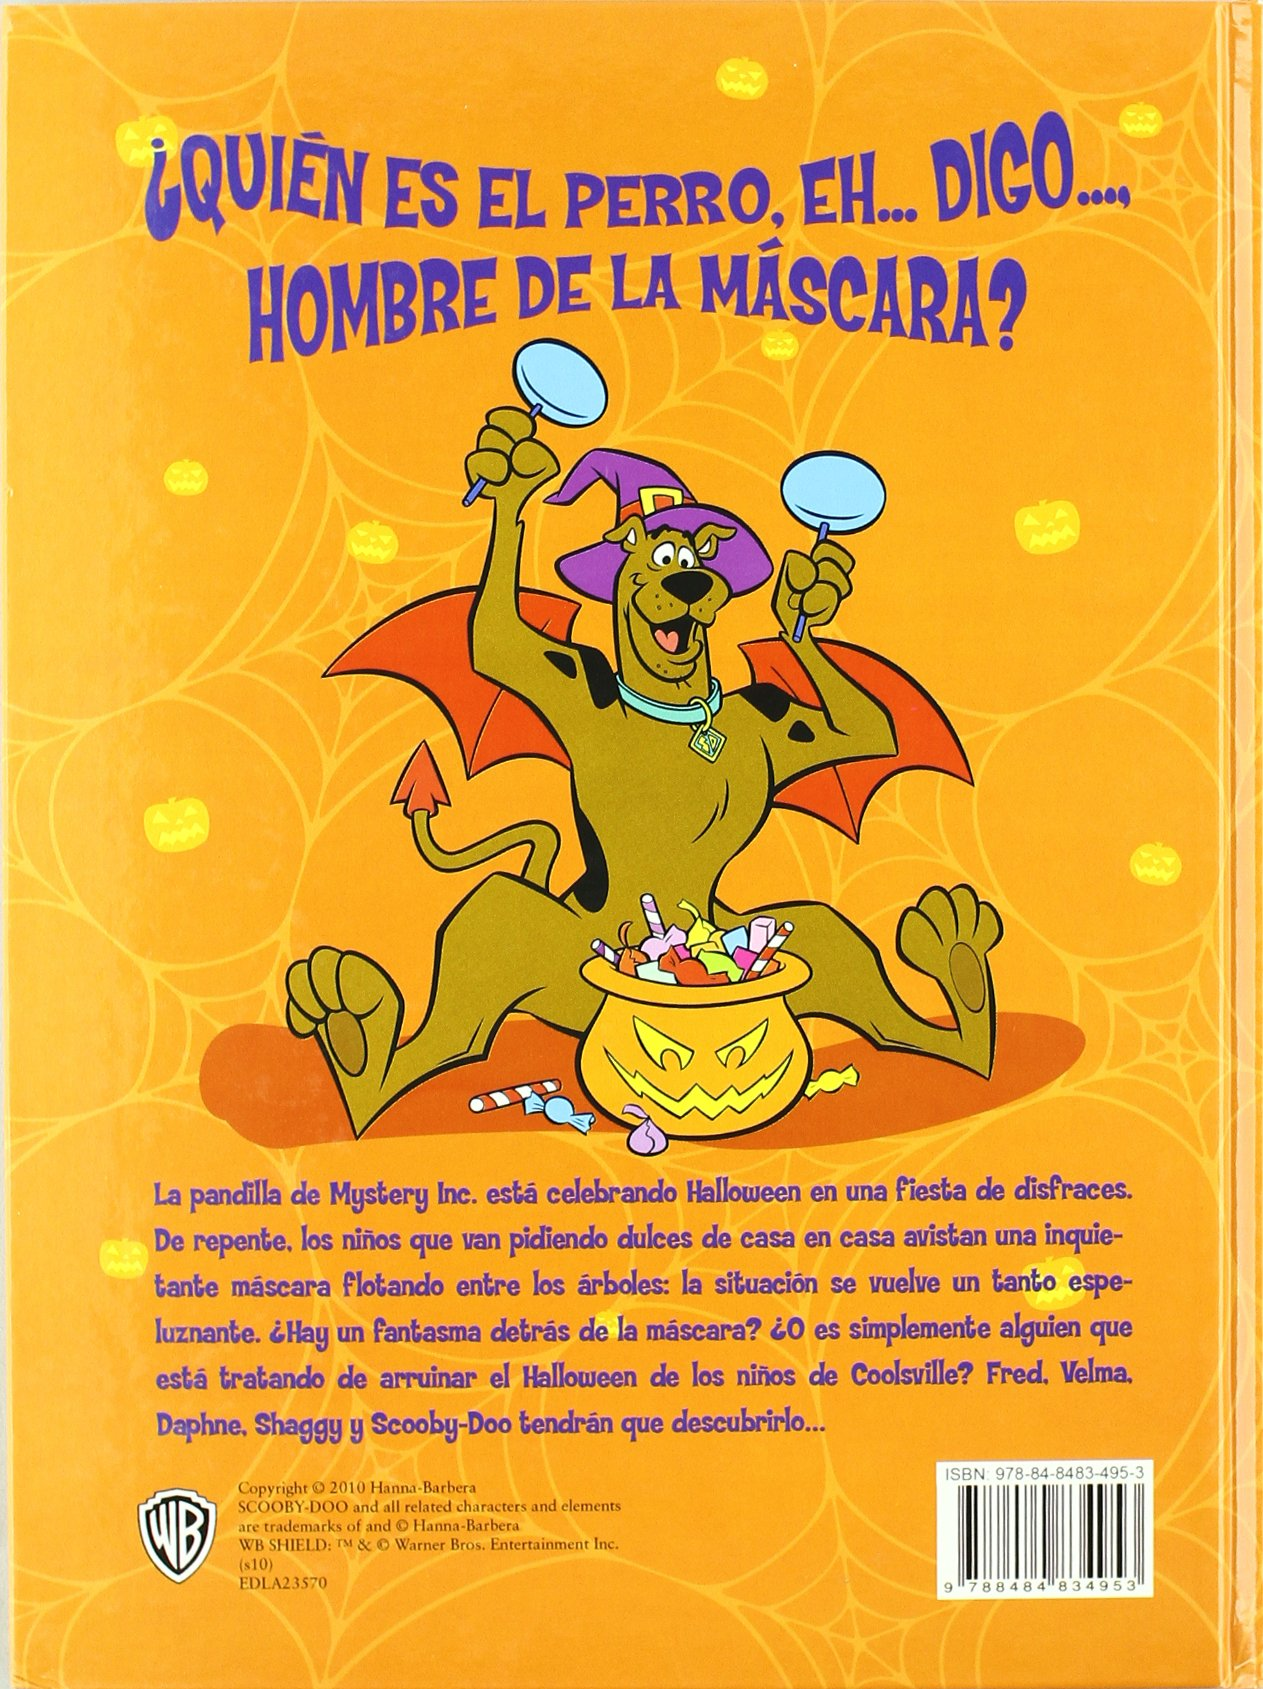 Scooby Doo y la máscara de Halloween embrujada: Jesse Leon McCann: 9788484834953: Amazon.com: Books